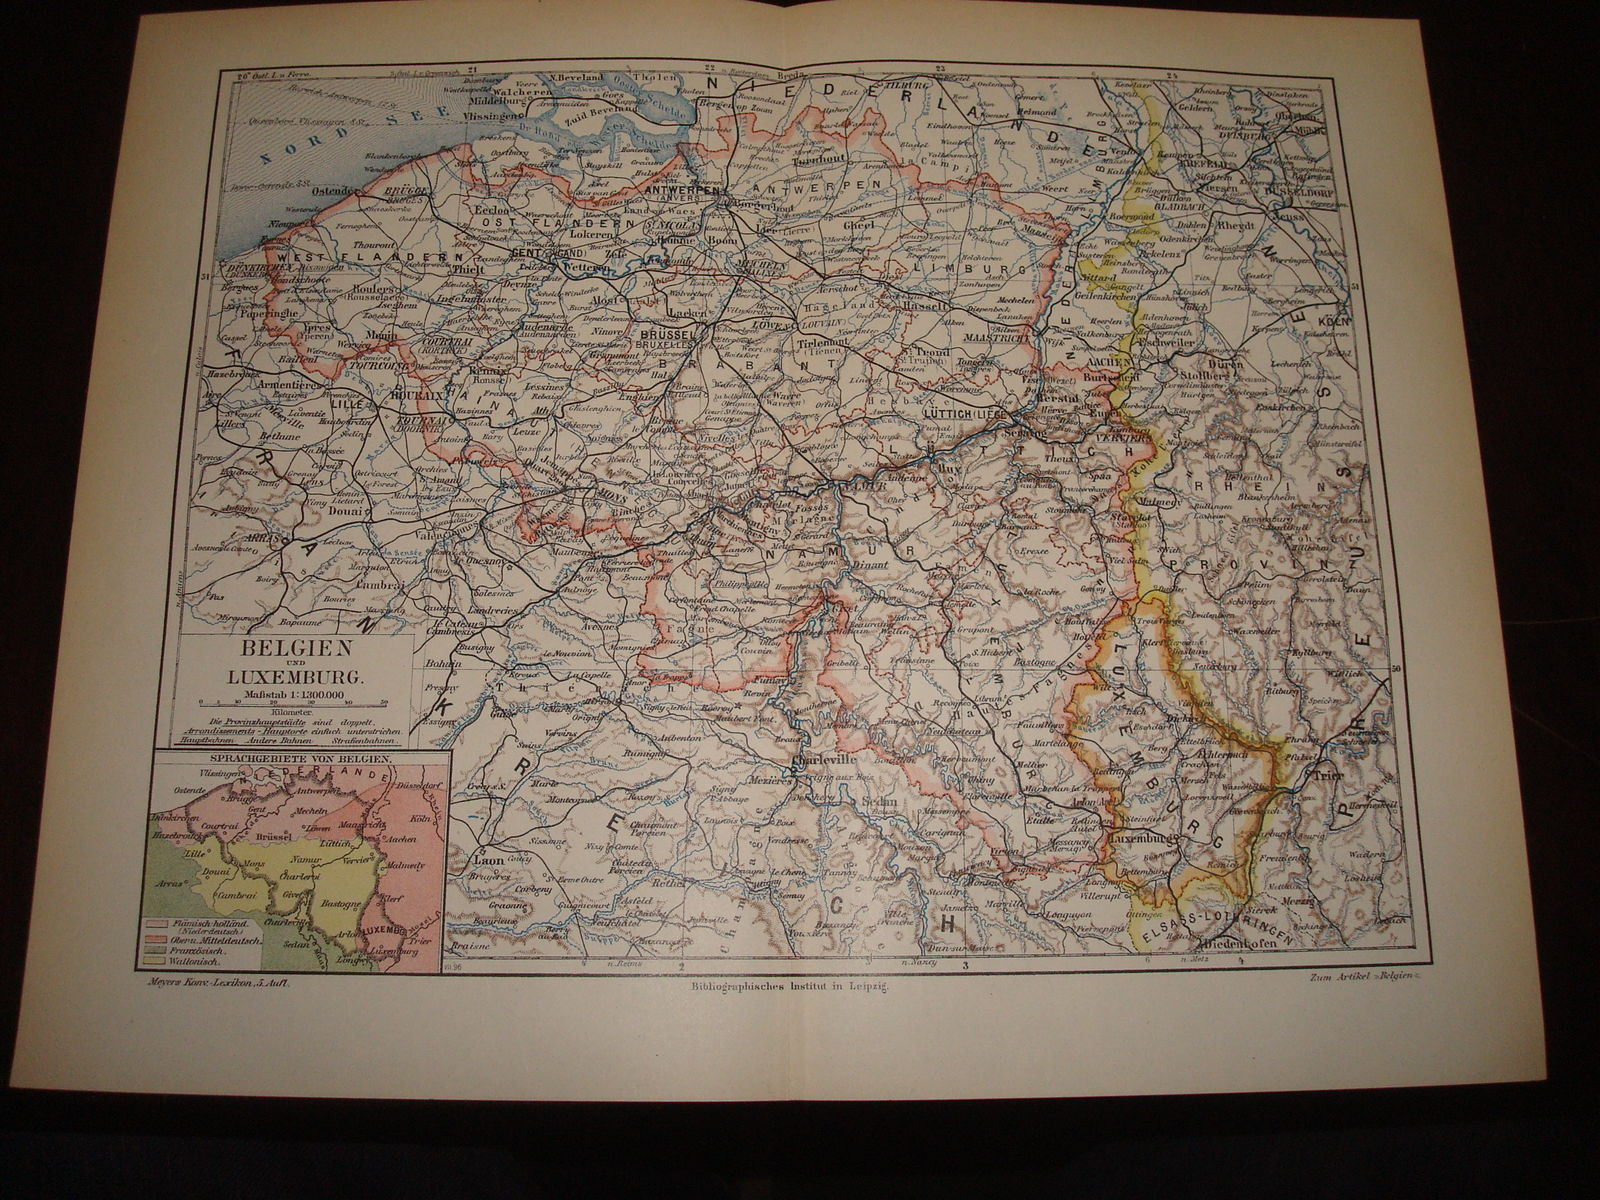 Holzschnitt - Holzstich - 1899 : Belgien und Luxemburg 1 : 1.300.000 Map Karte. Koloriert.